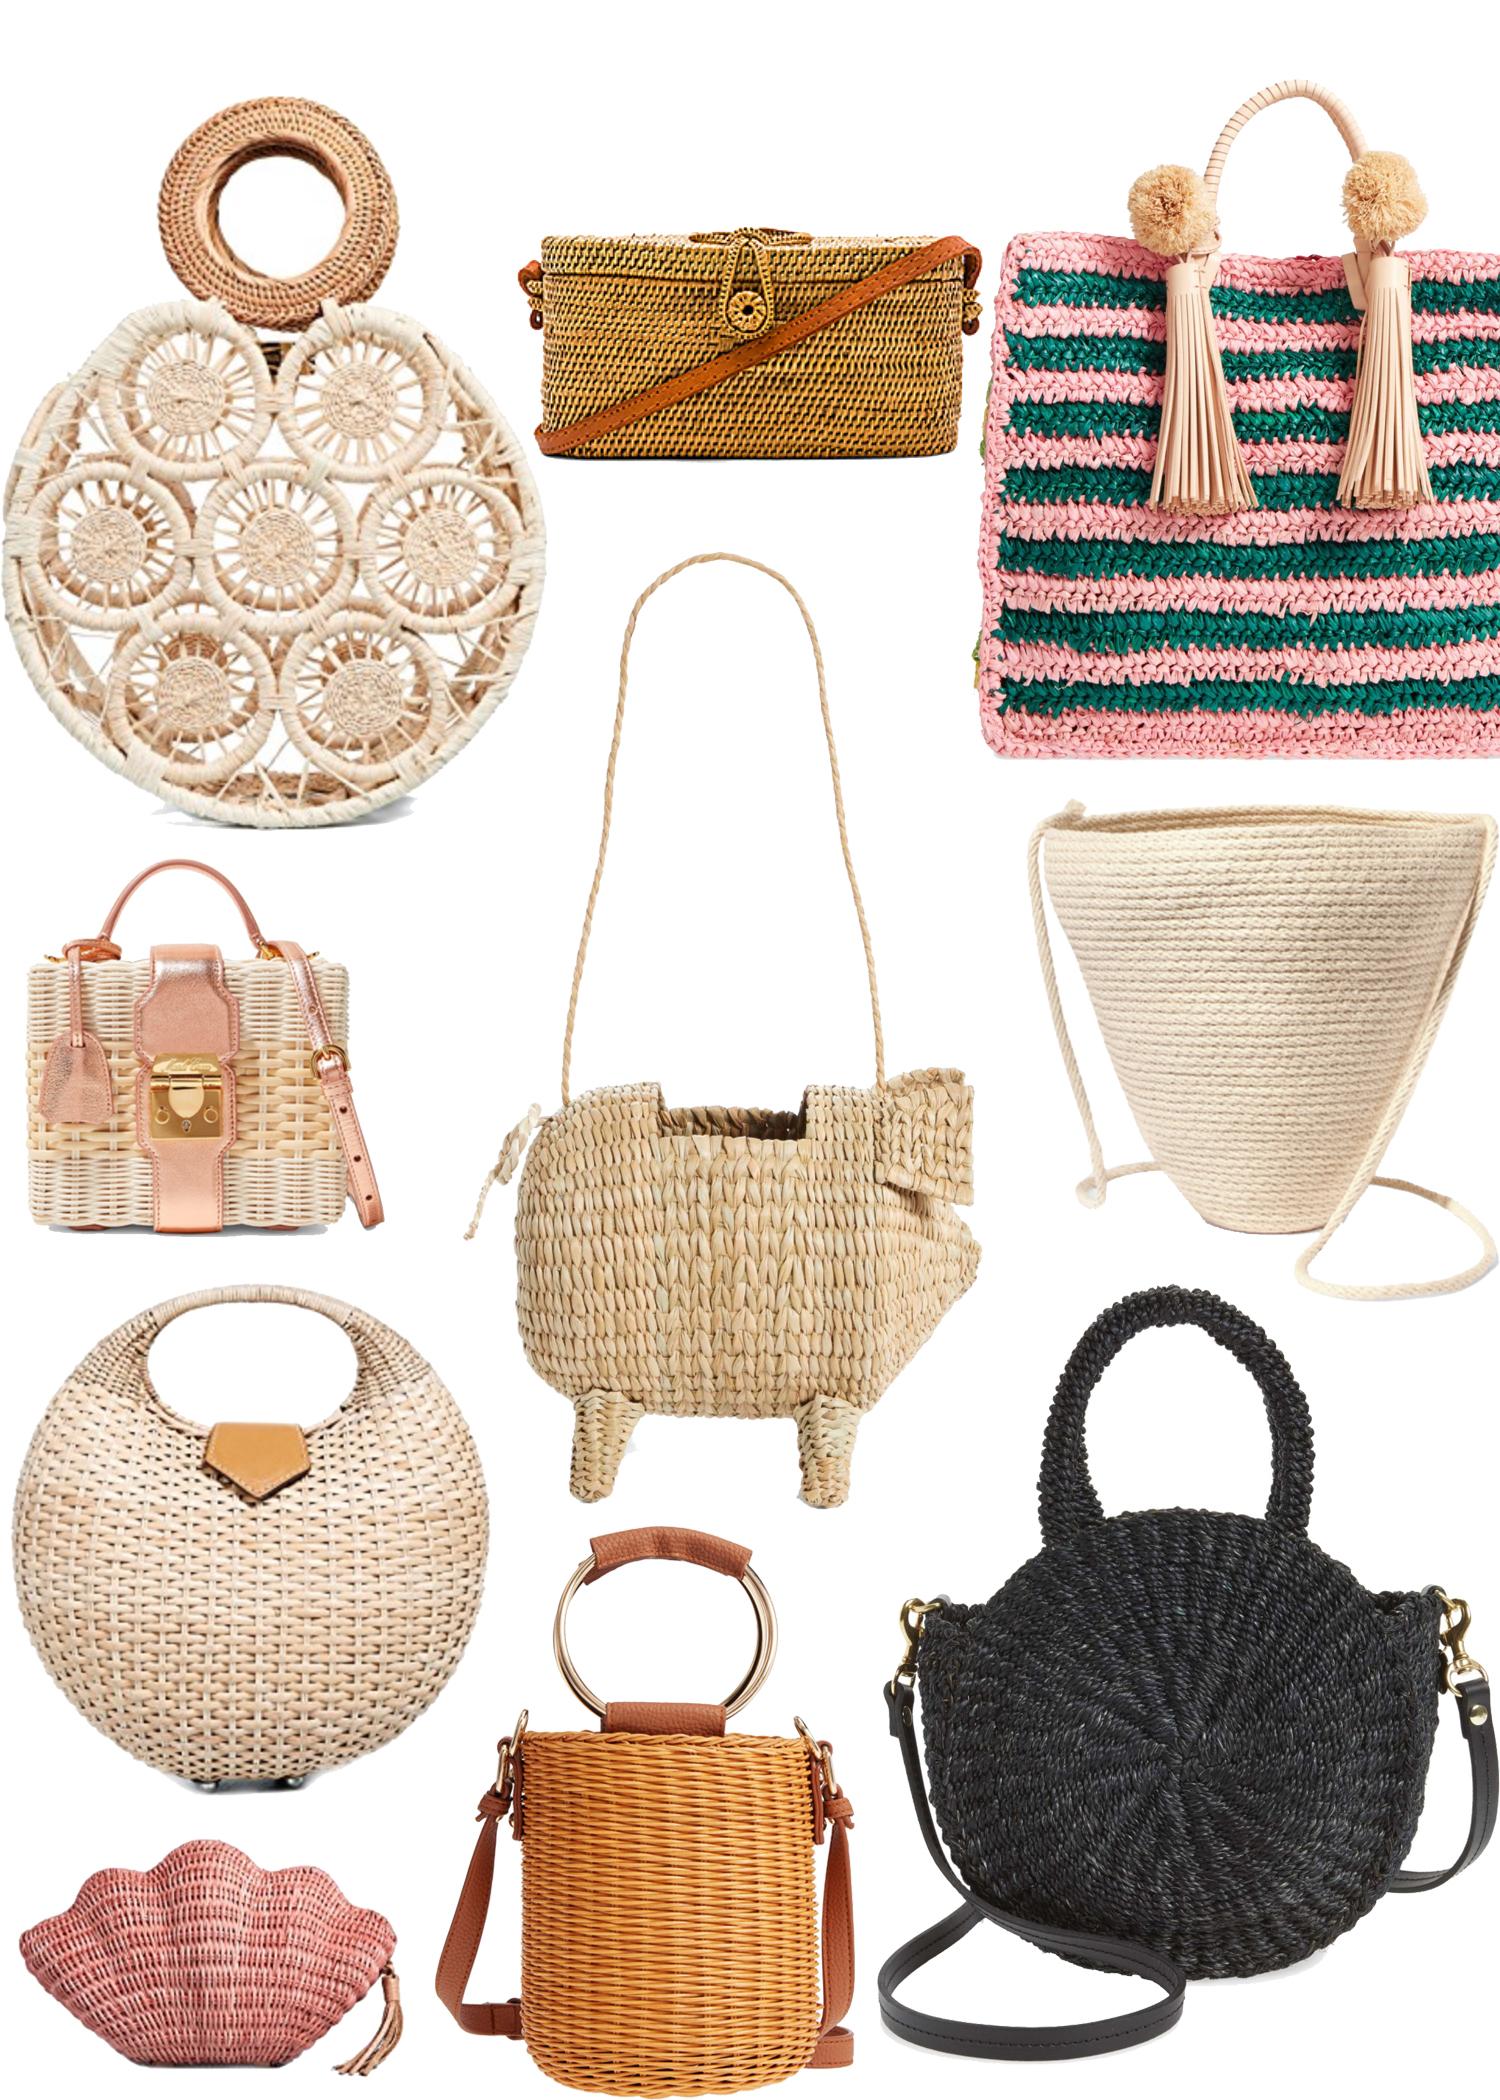 Basket Bags Woven Spring It Bag Trend Cult Gaia Kayu Nordstrom Handbag Bop Loeffler Randall Top Handle